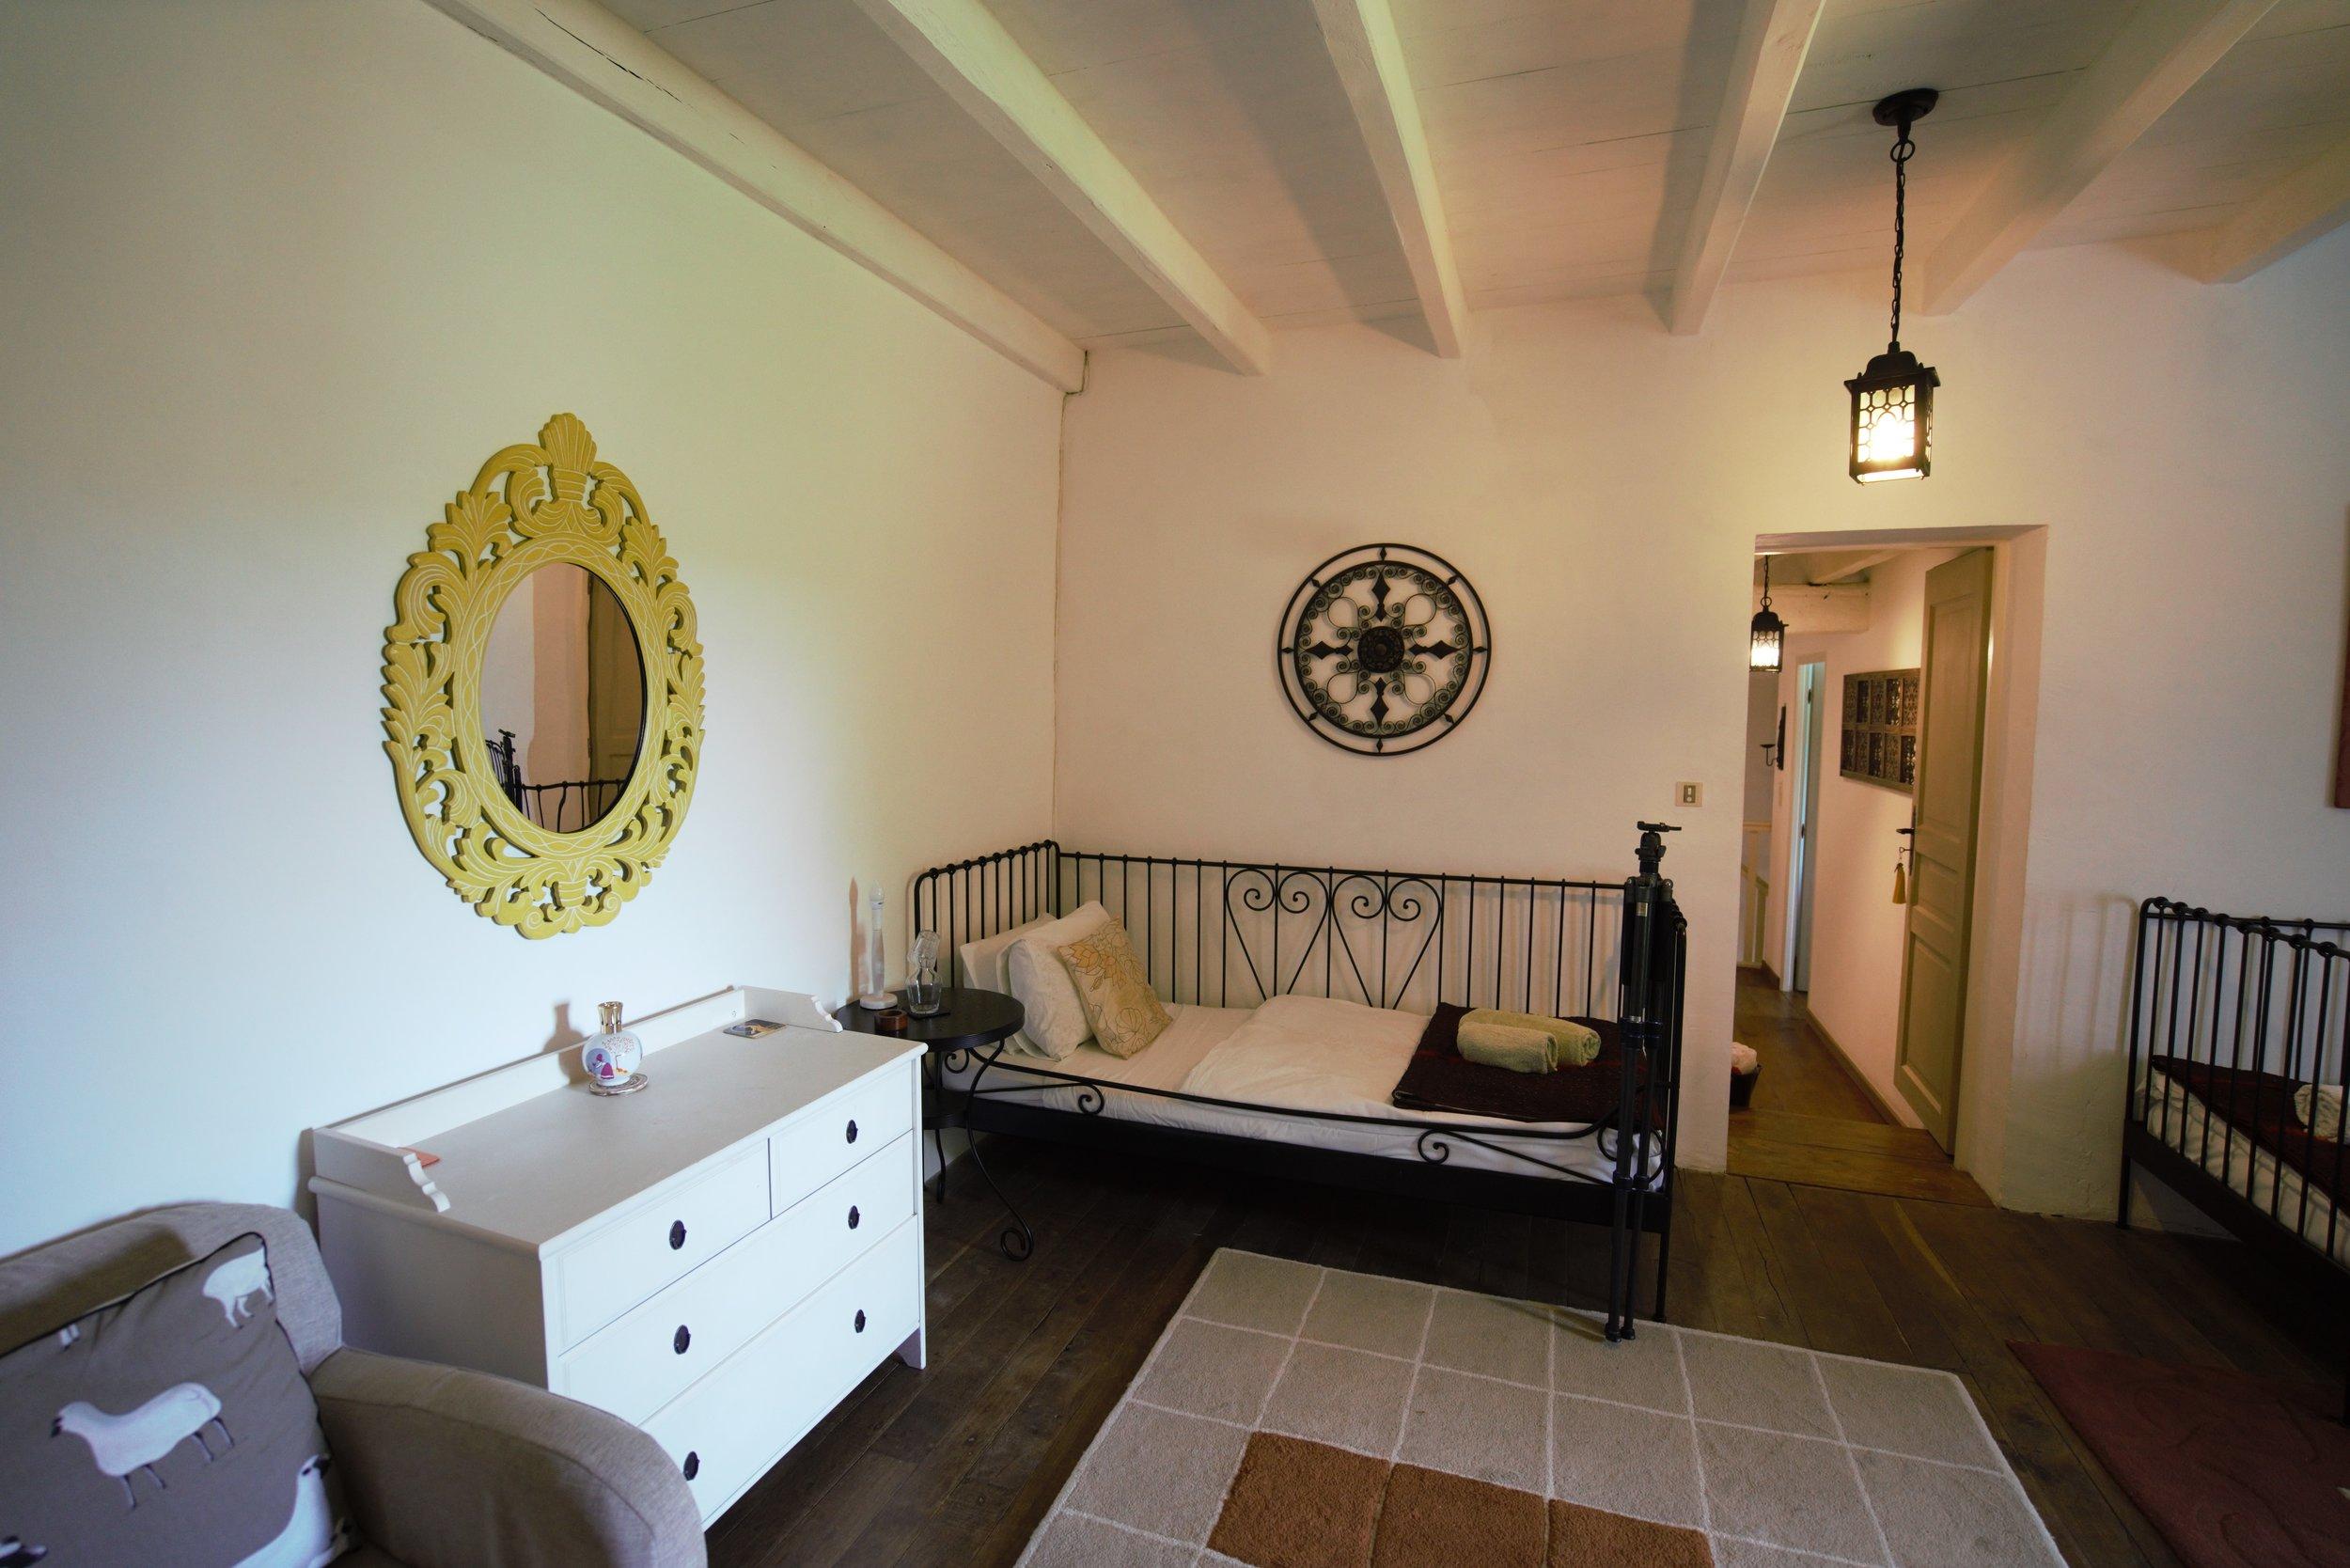 White beams and oak floors